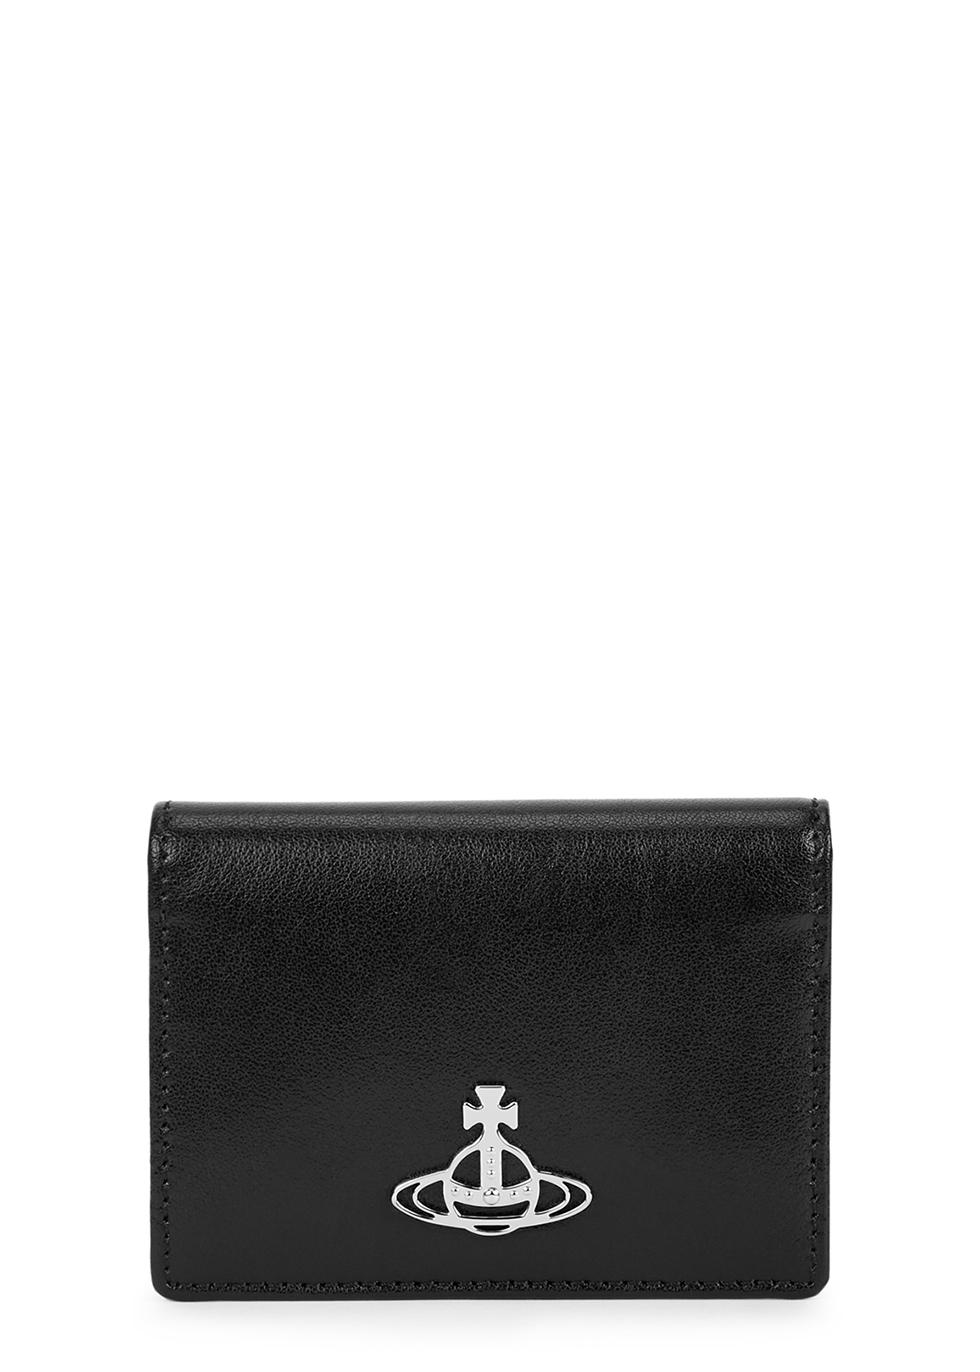 Anna black leather card holder